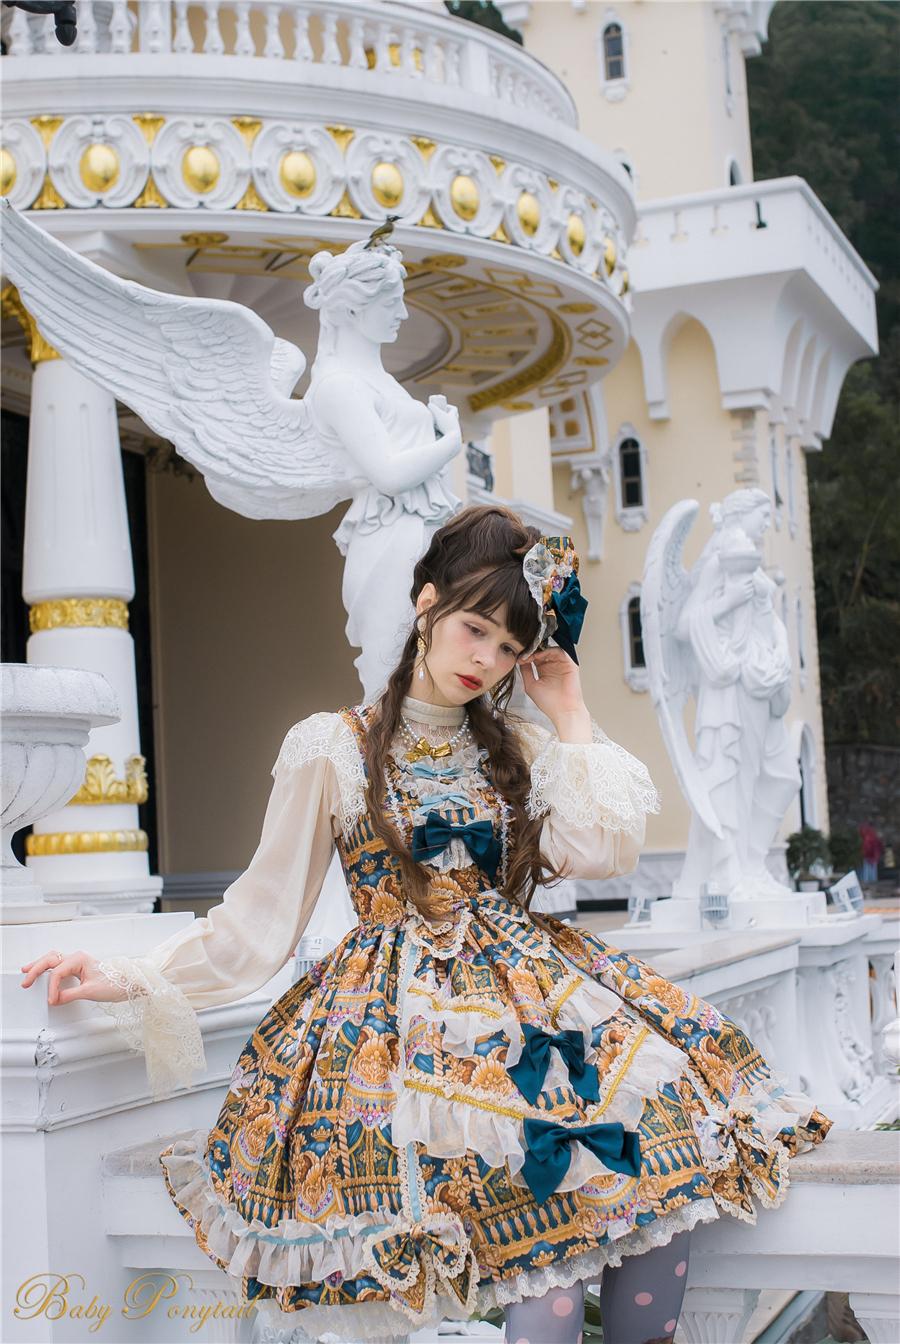 Babyponytail_Model_JSK_Tiel Present Angel_Claudia_2_05.jpg